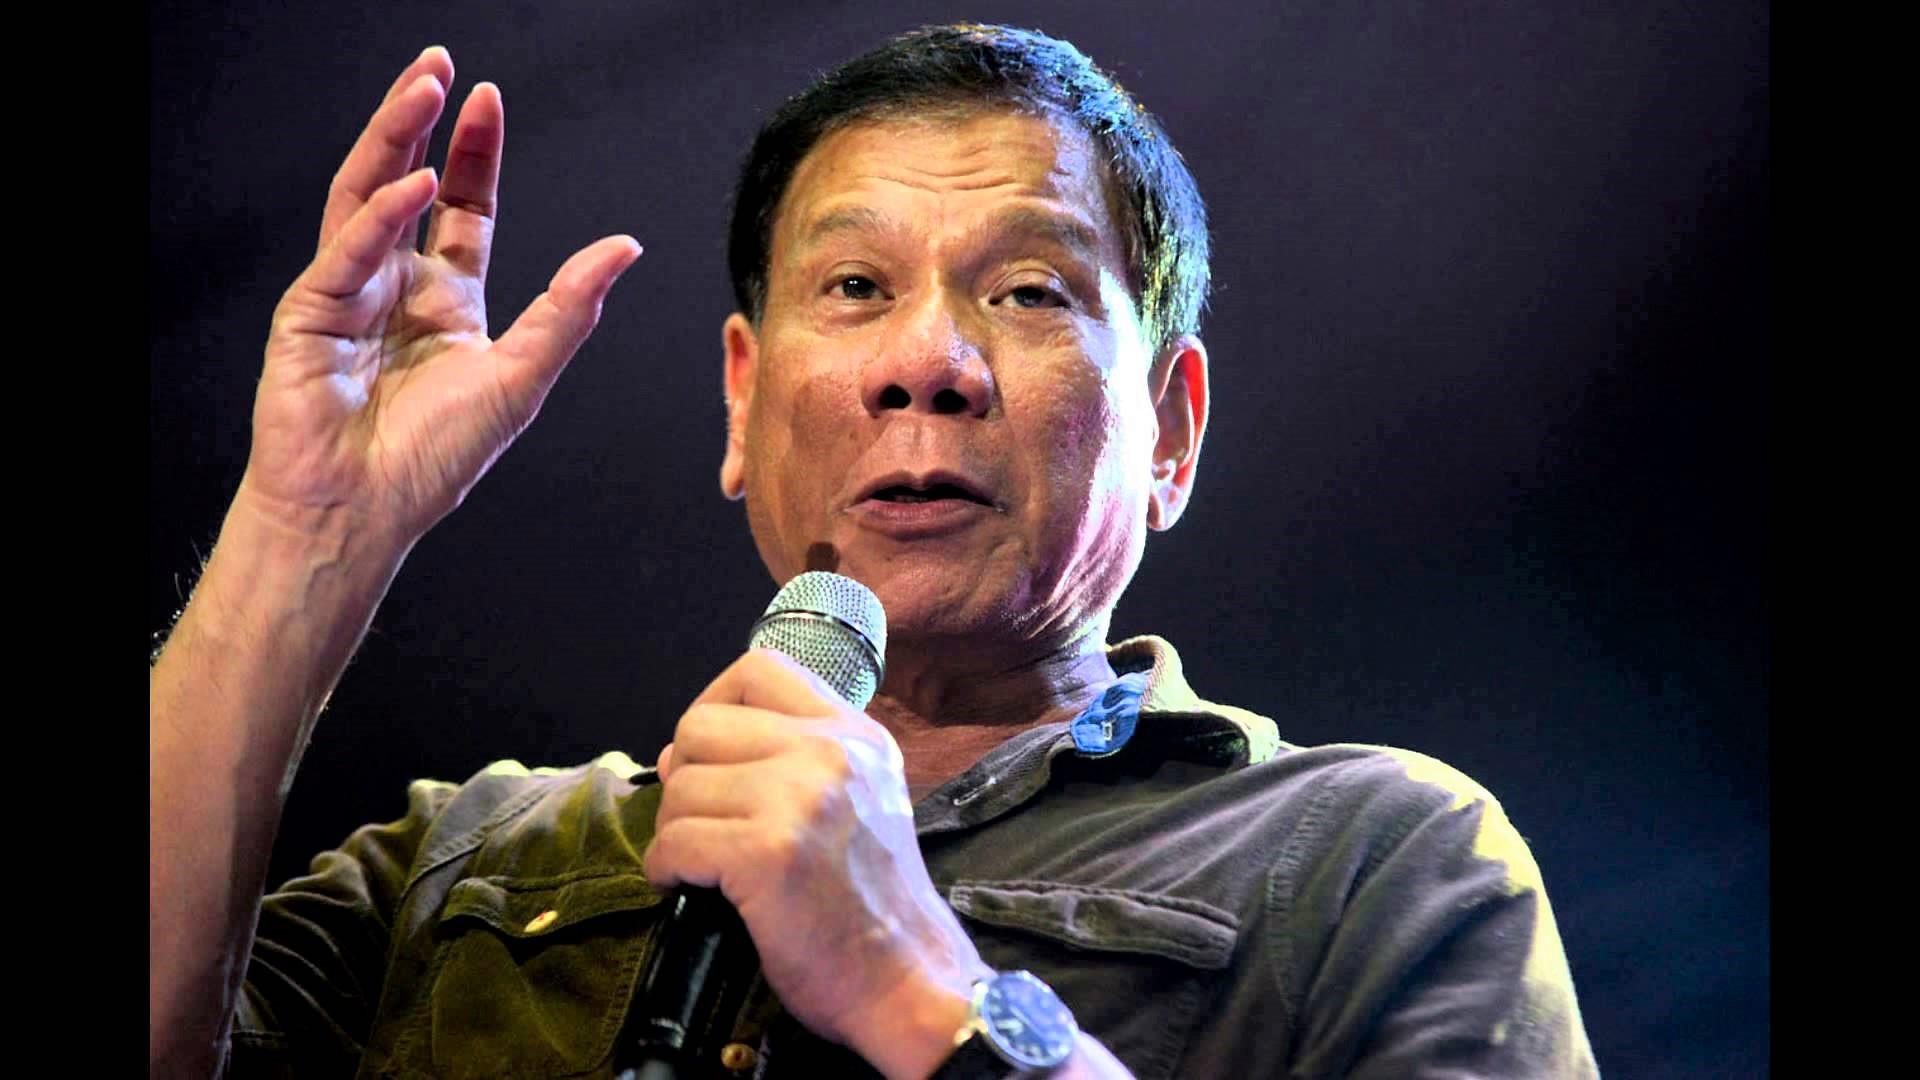 Ill Eat Your Liver Duterte Vows to Punish Islamist Terrorists 1920x1080